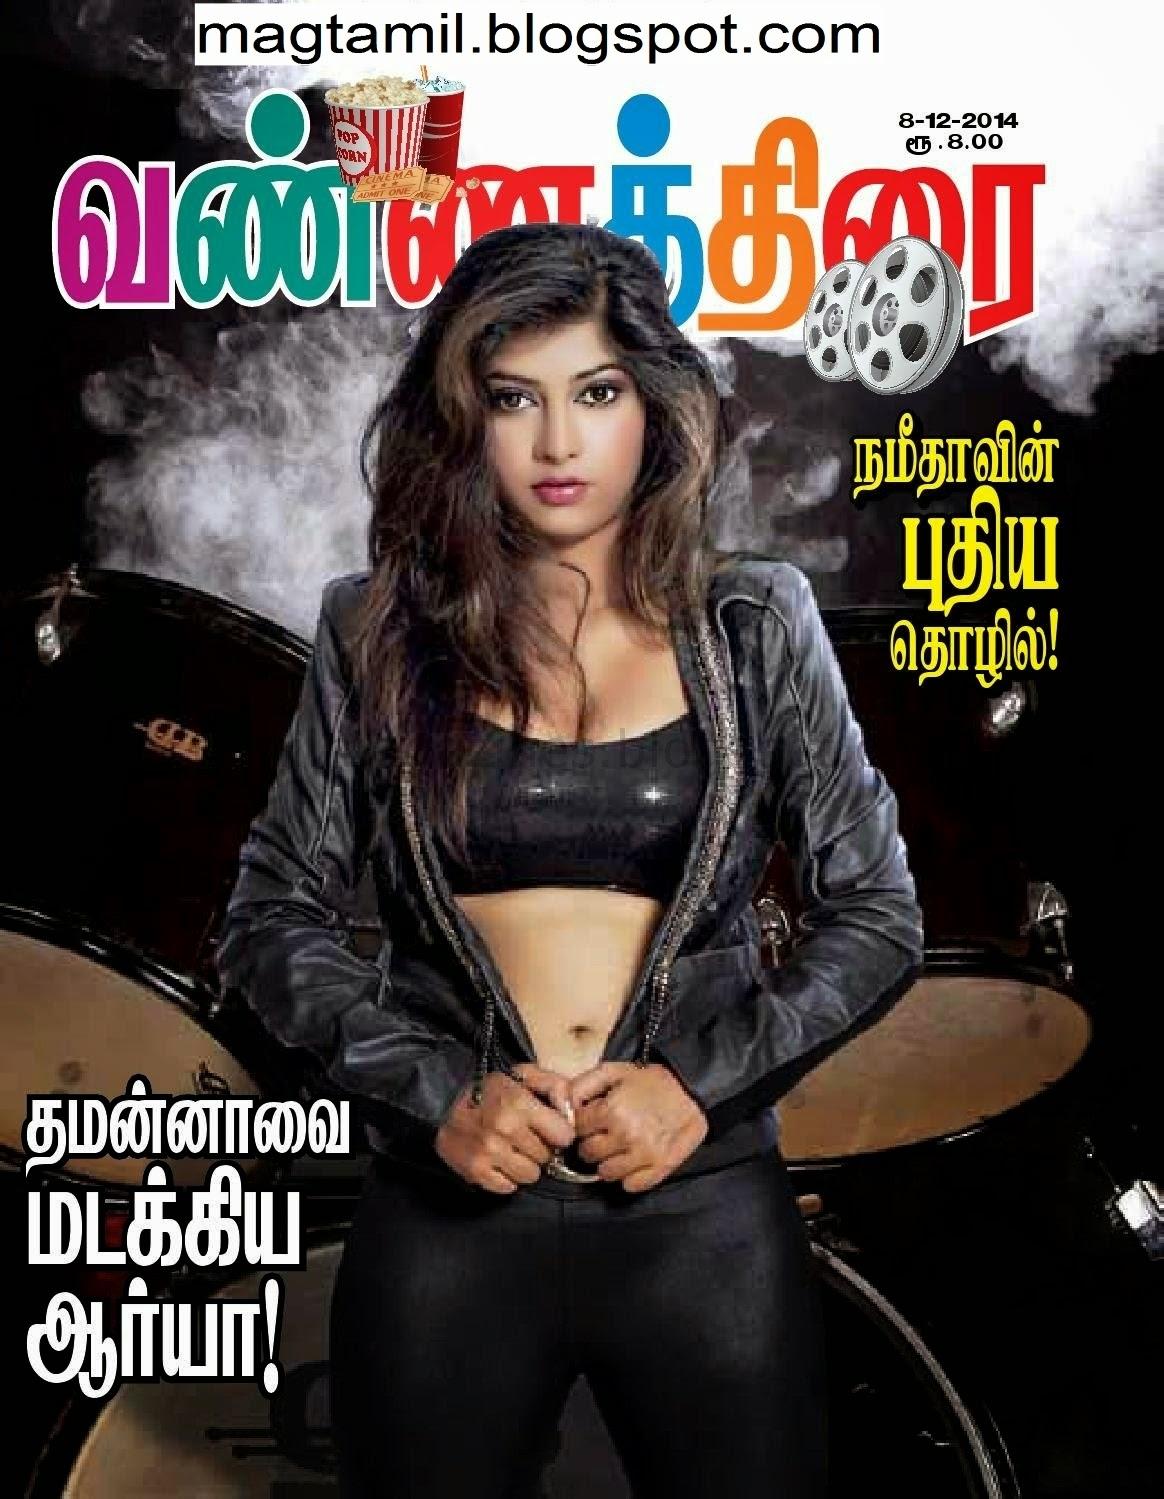 Read Vannathirai Hot 8-12-2014 Tamil Magazines Online Free